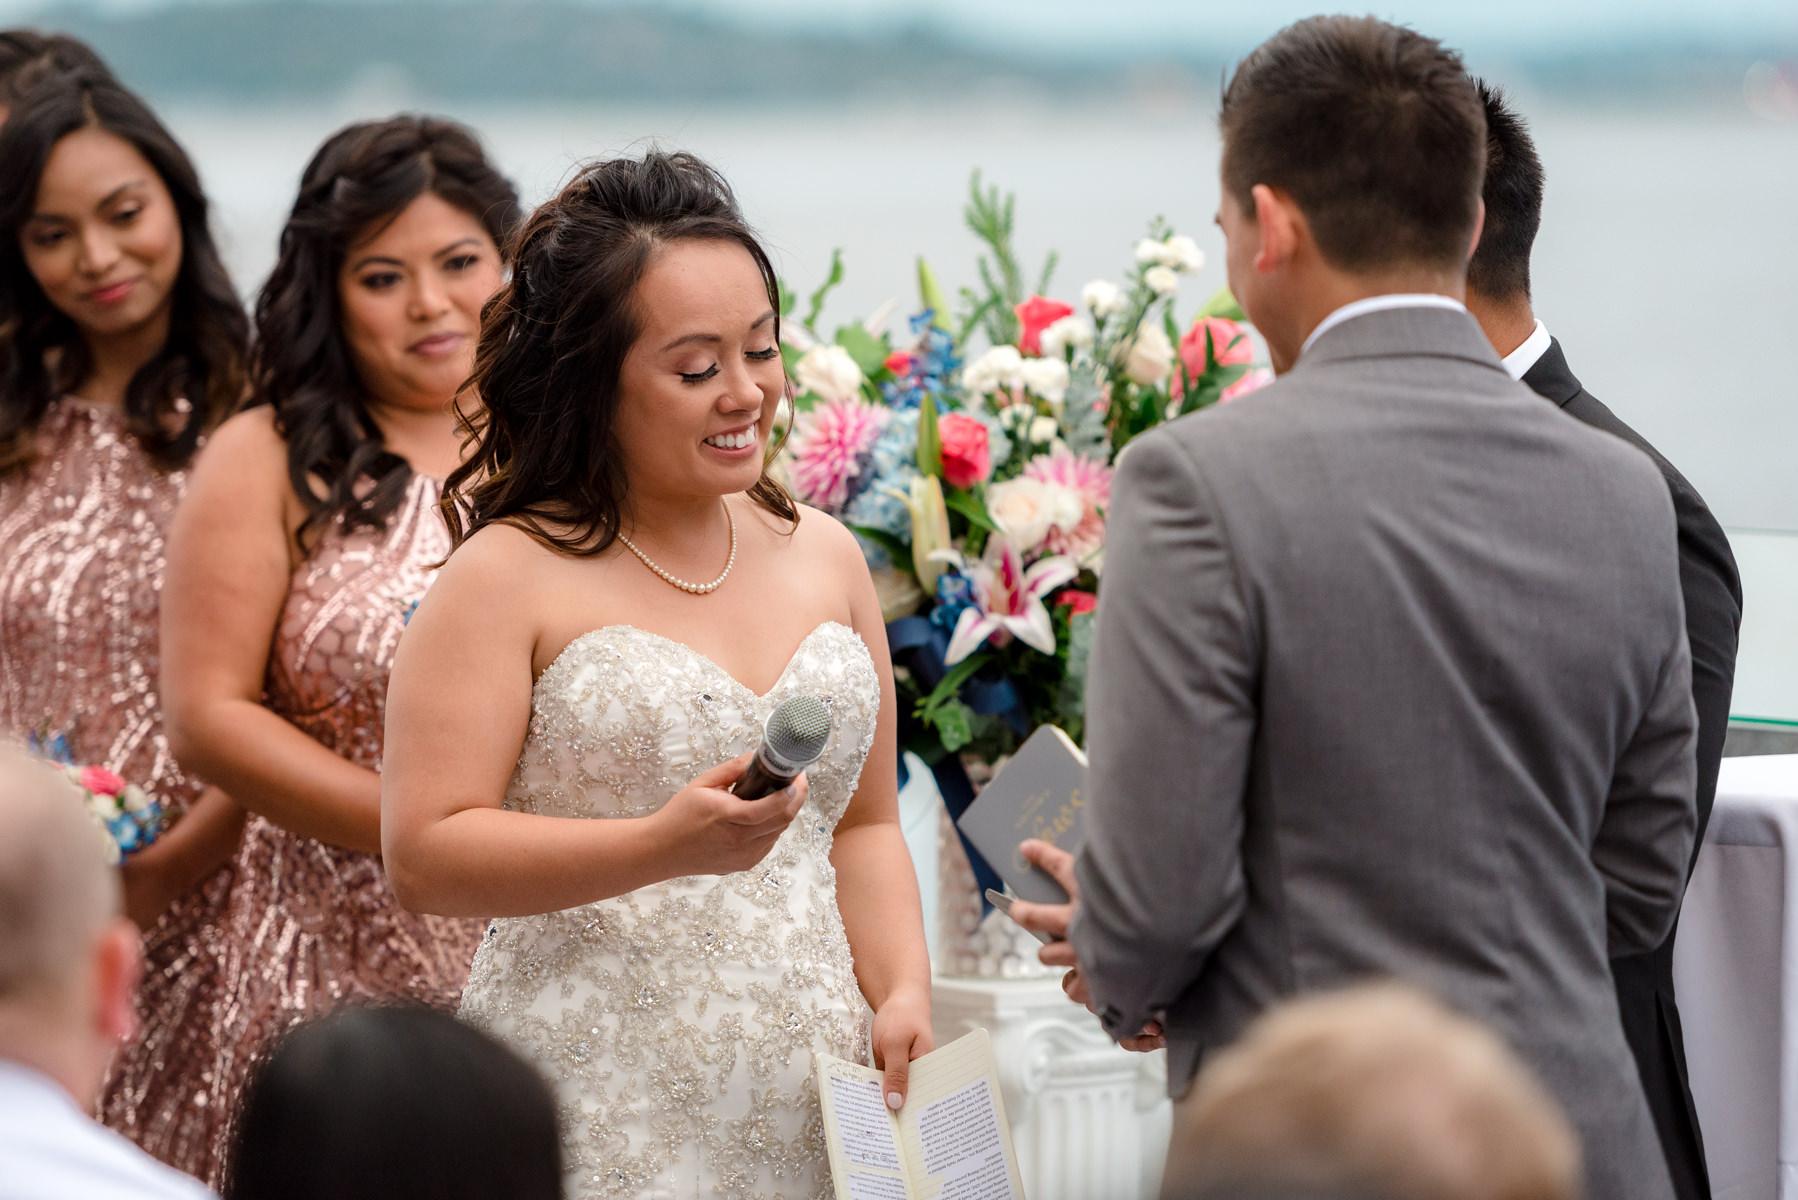 Andrew Tat - Documentary Wedding Photography - Salty's - Seattle, Washington -Mark & Marcy - 13.jpg